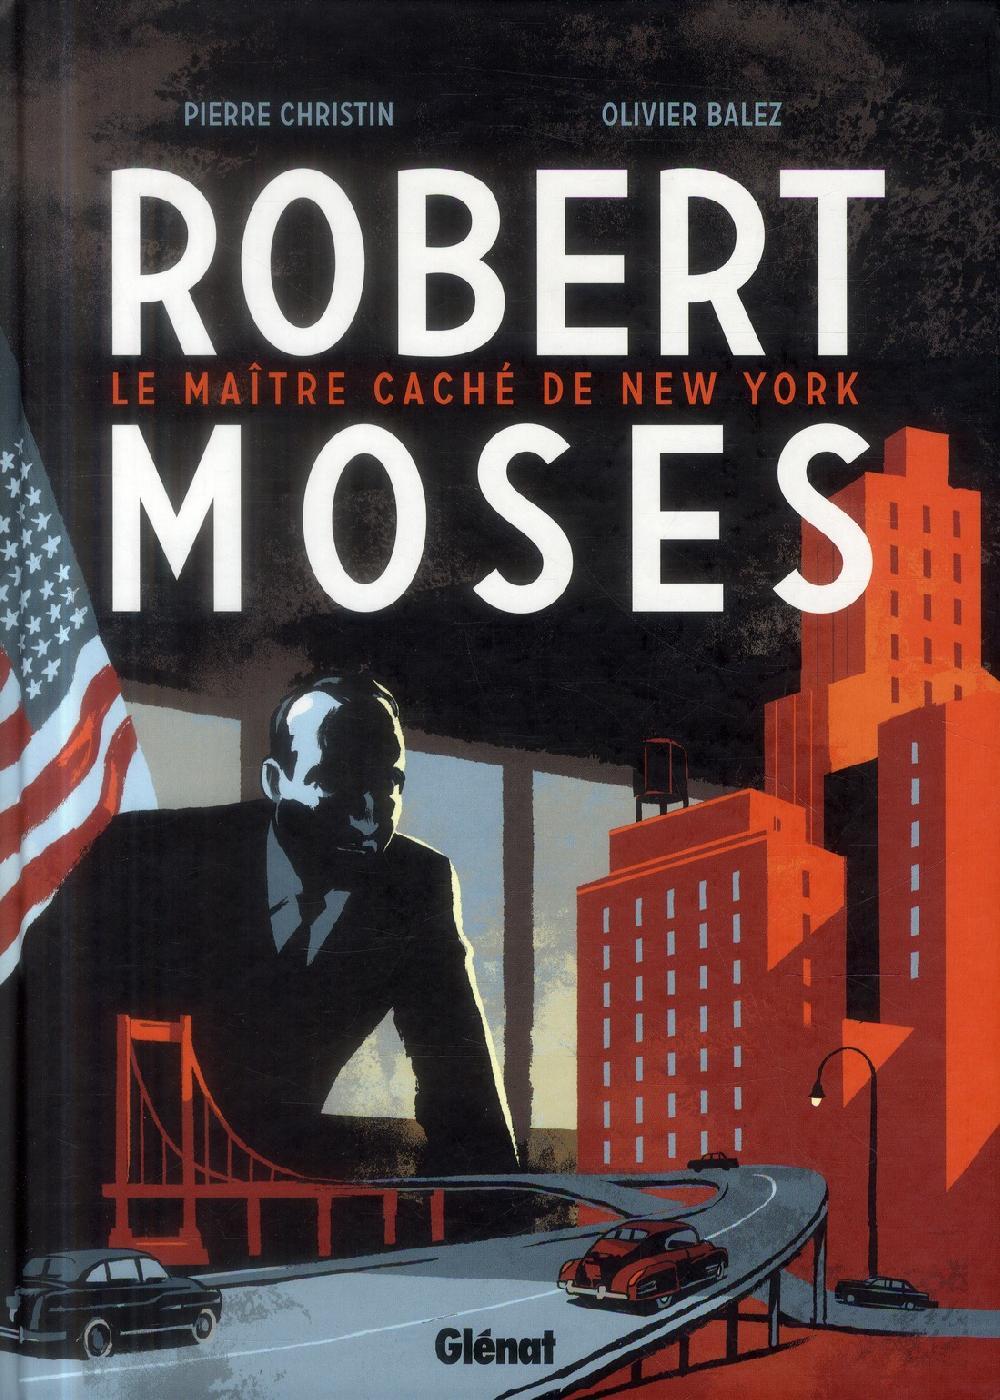 Robert Moses - Le maître caché de New York